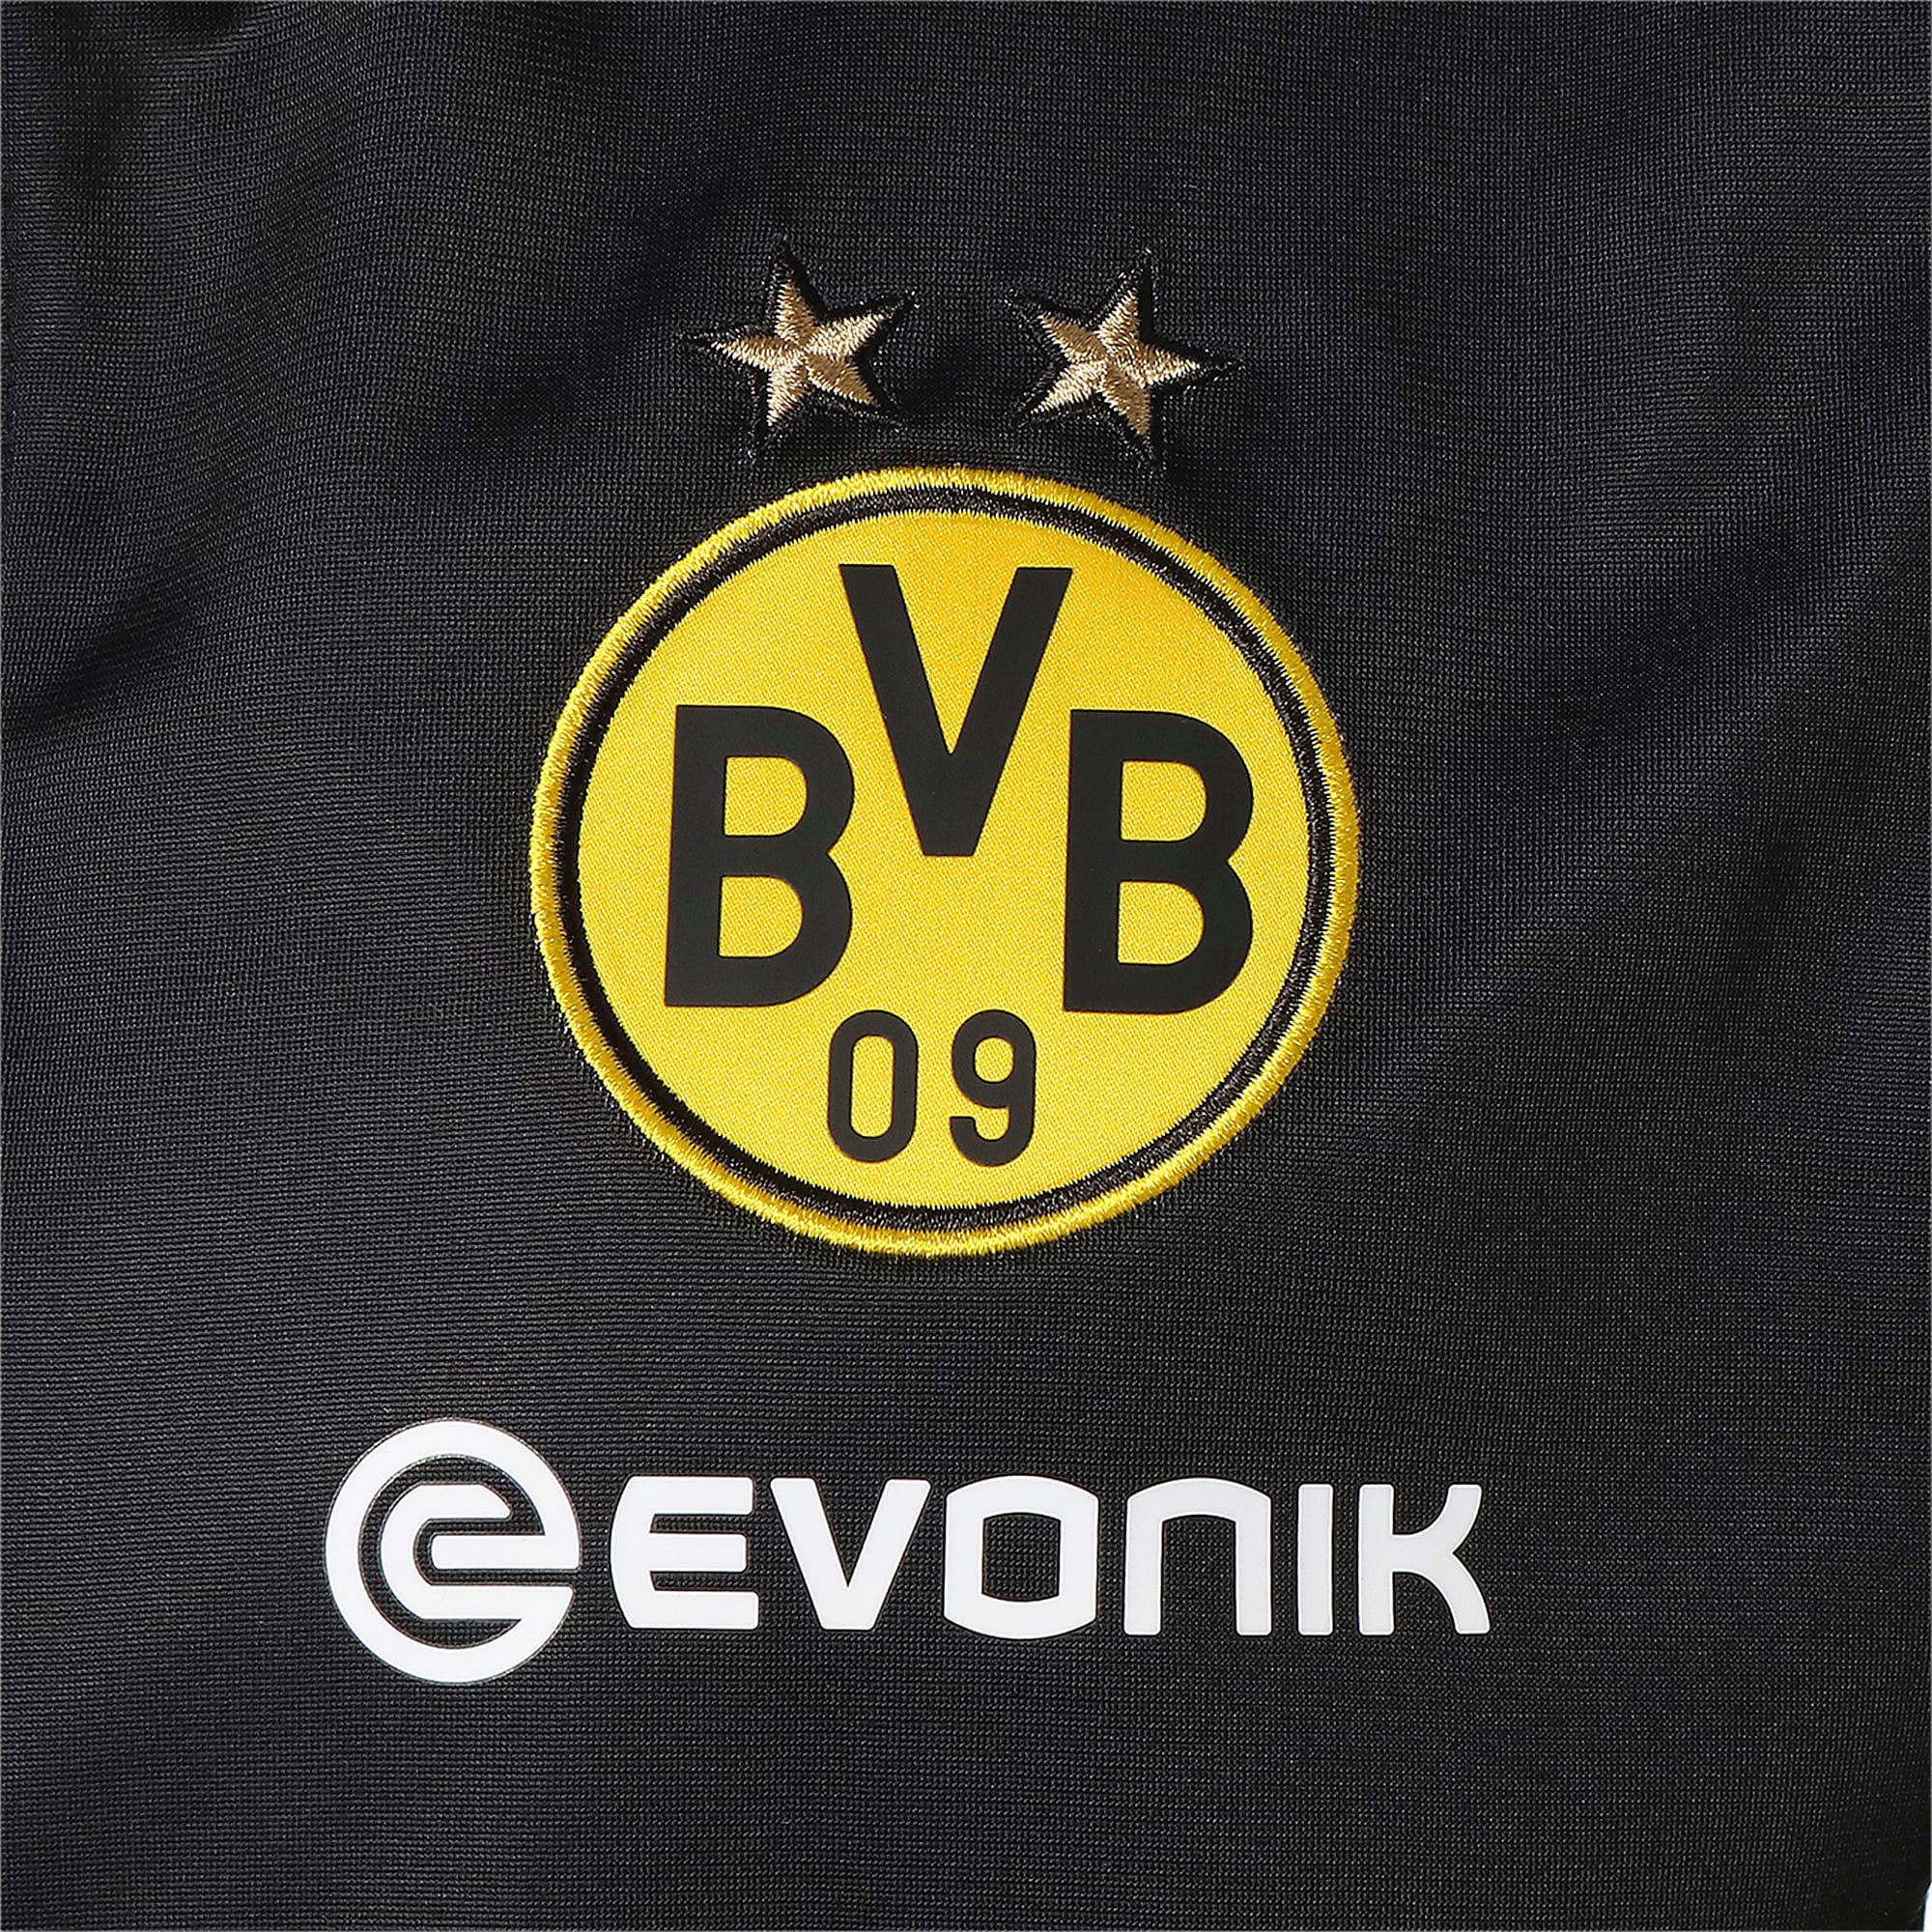 Thumbnail 8 of ドルトムント BVB INT スタジアム ジャケット, Puma Black-Cyber Yellow, medium-JPN